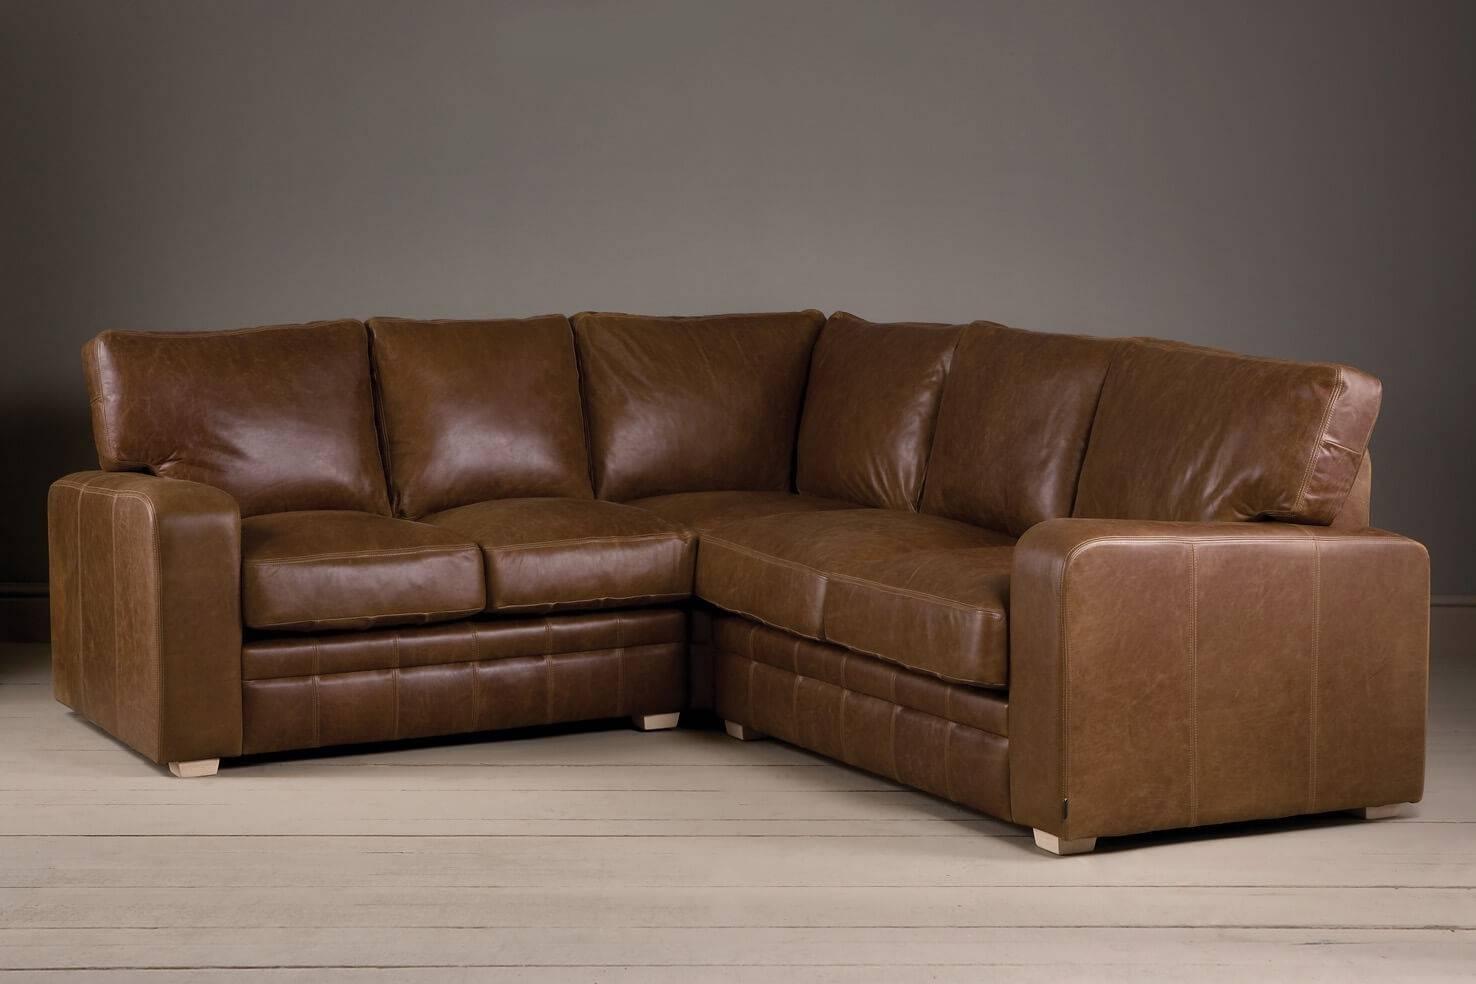 The Square Arm Leather Corner Sofaindigo Furniture within Corner Sofas (Image 13 of 15)